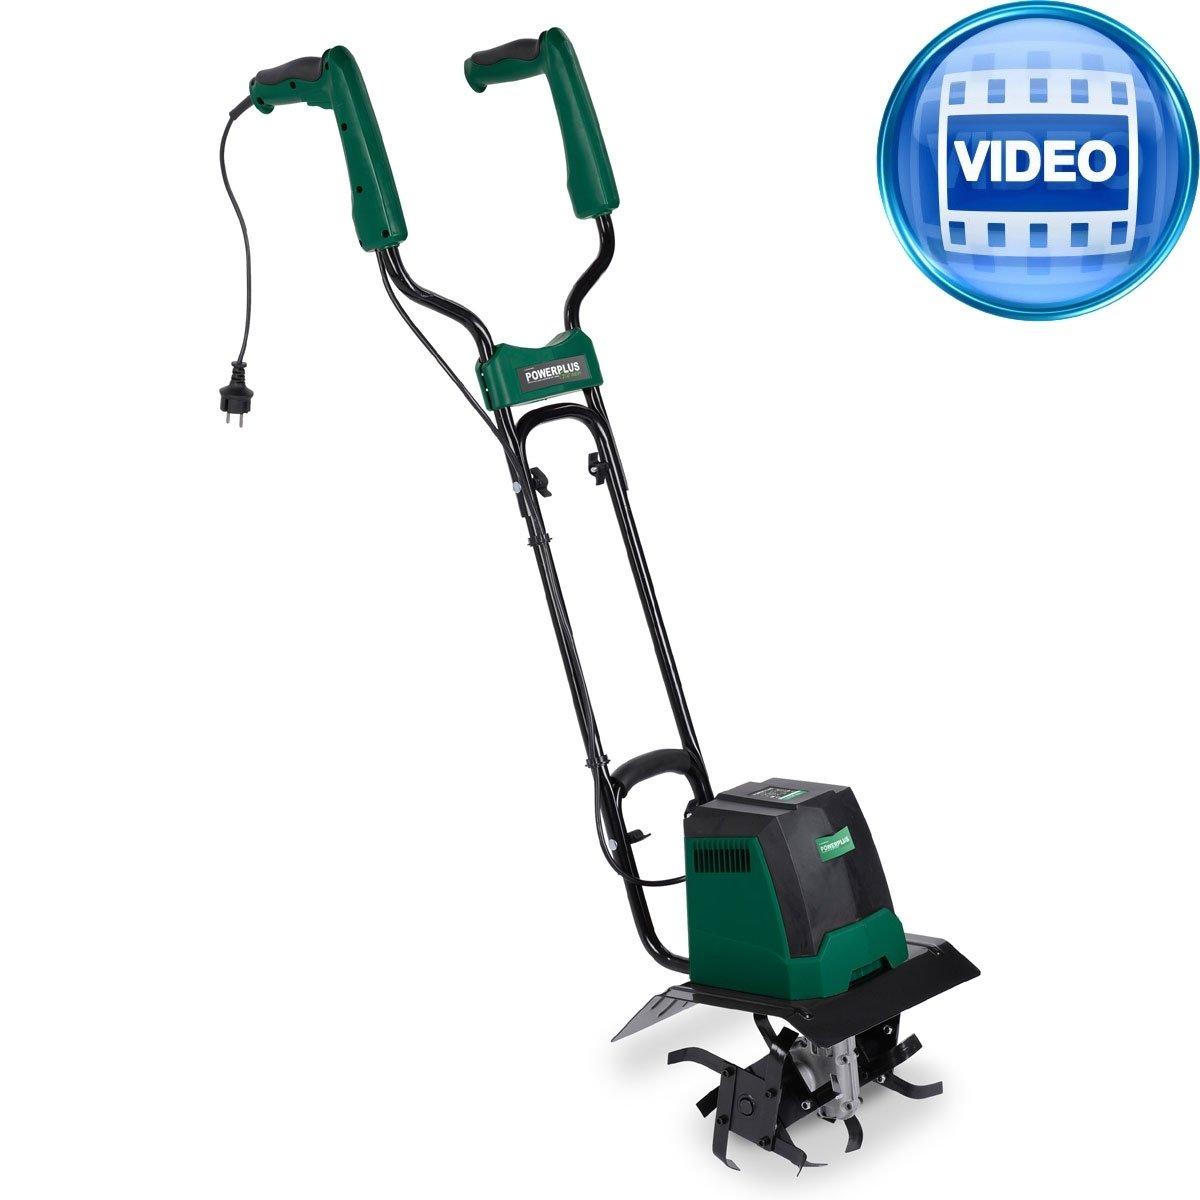 Varo POW6466 - Motoazada eléctrica (800 W): Amazon.es ...